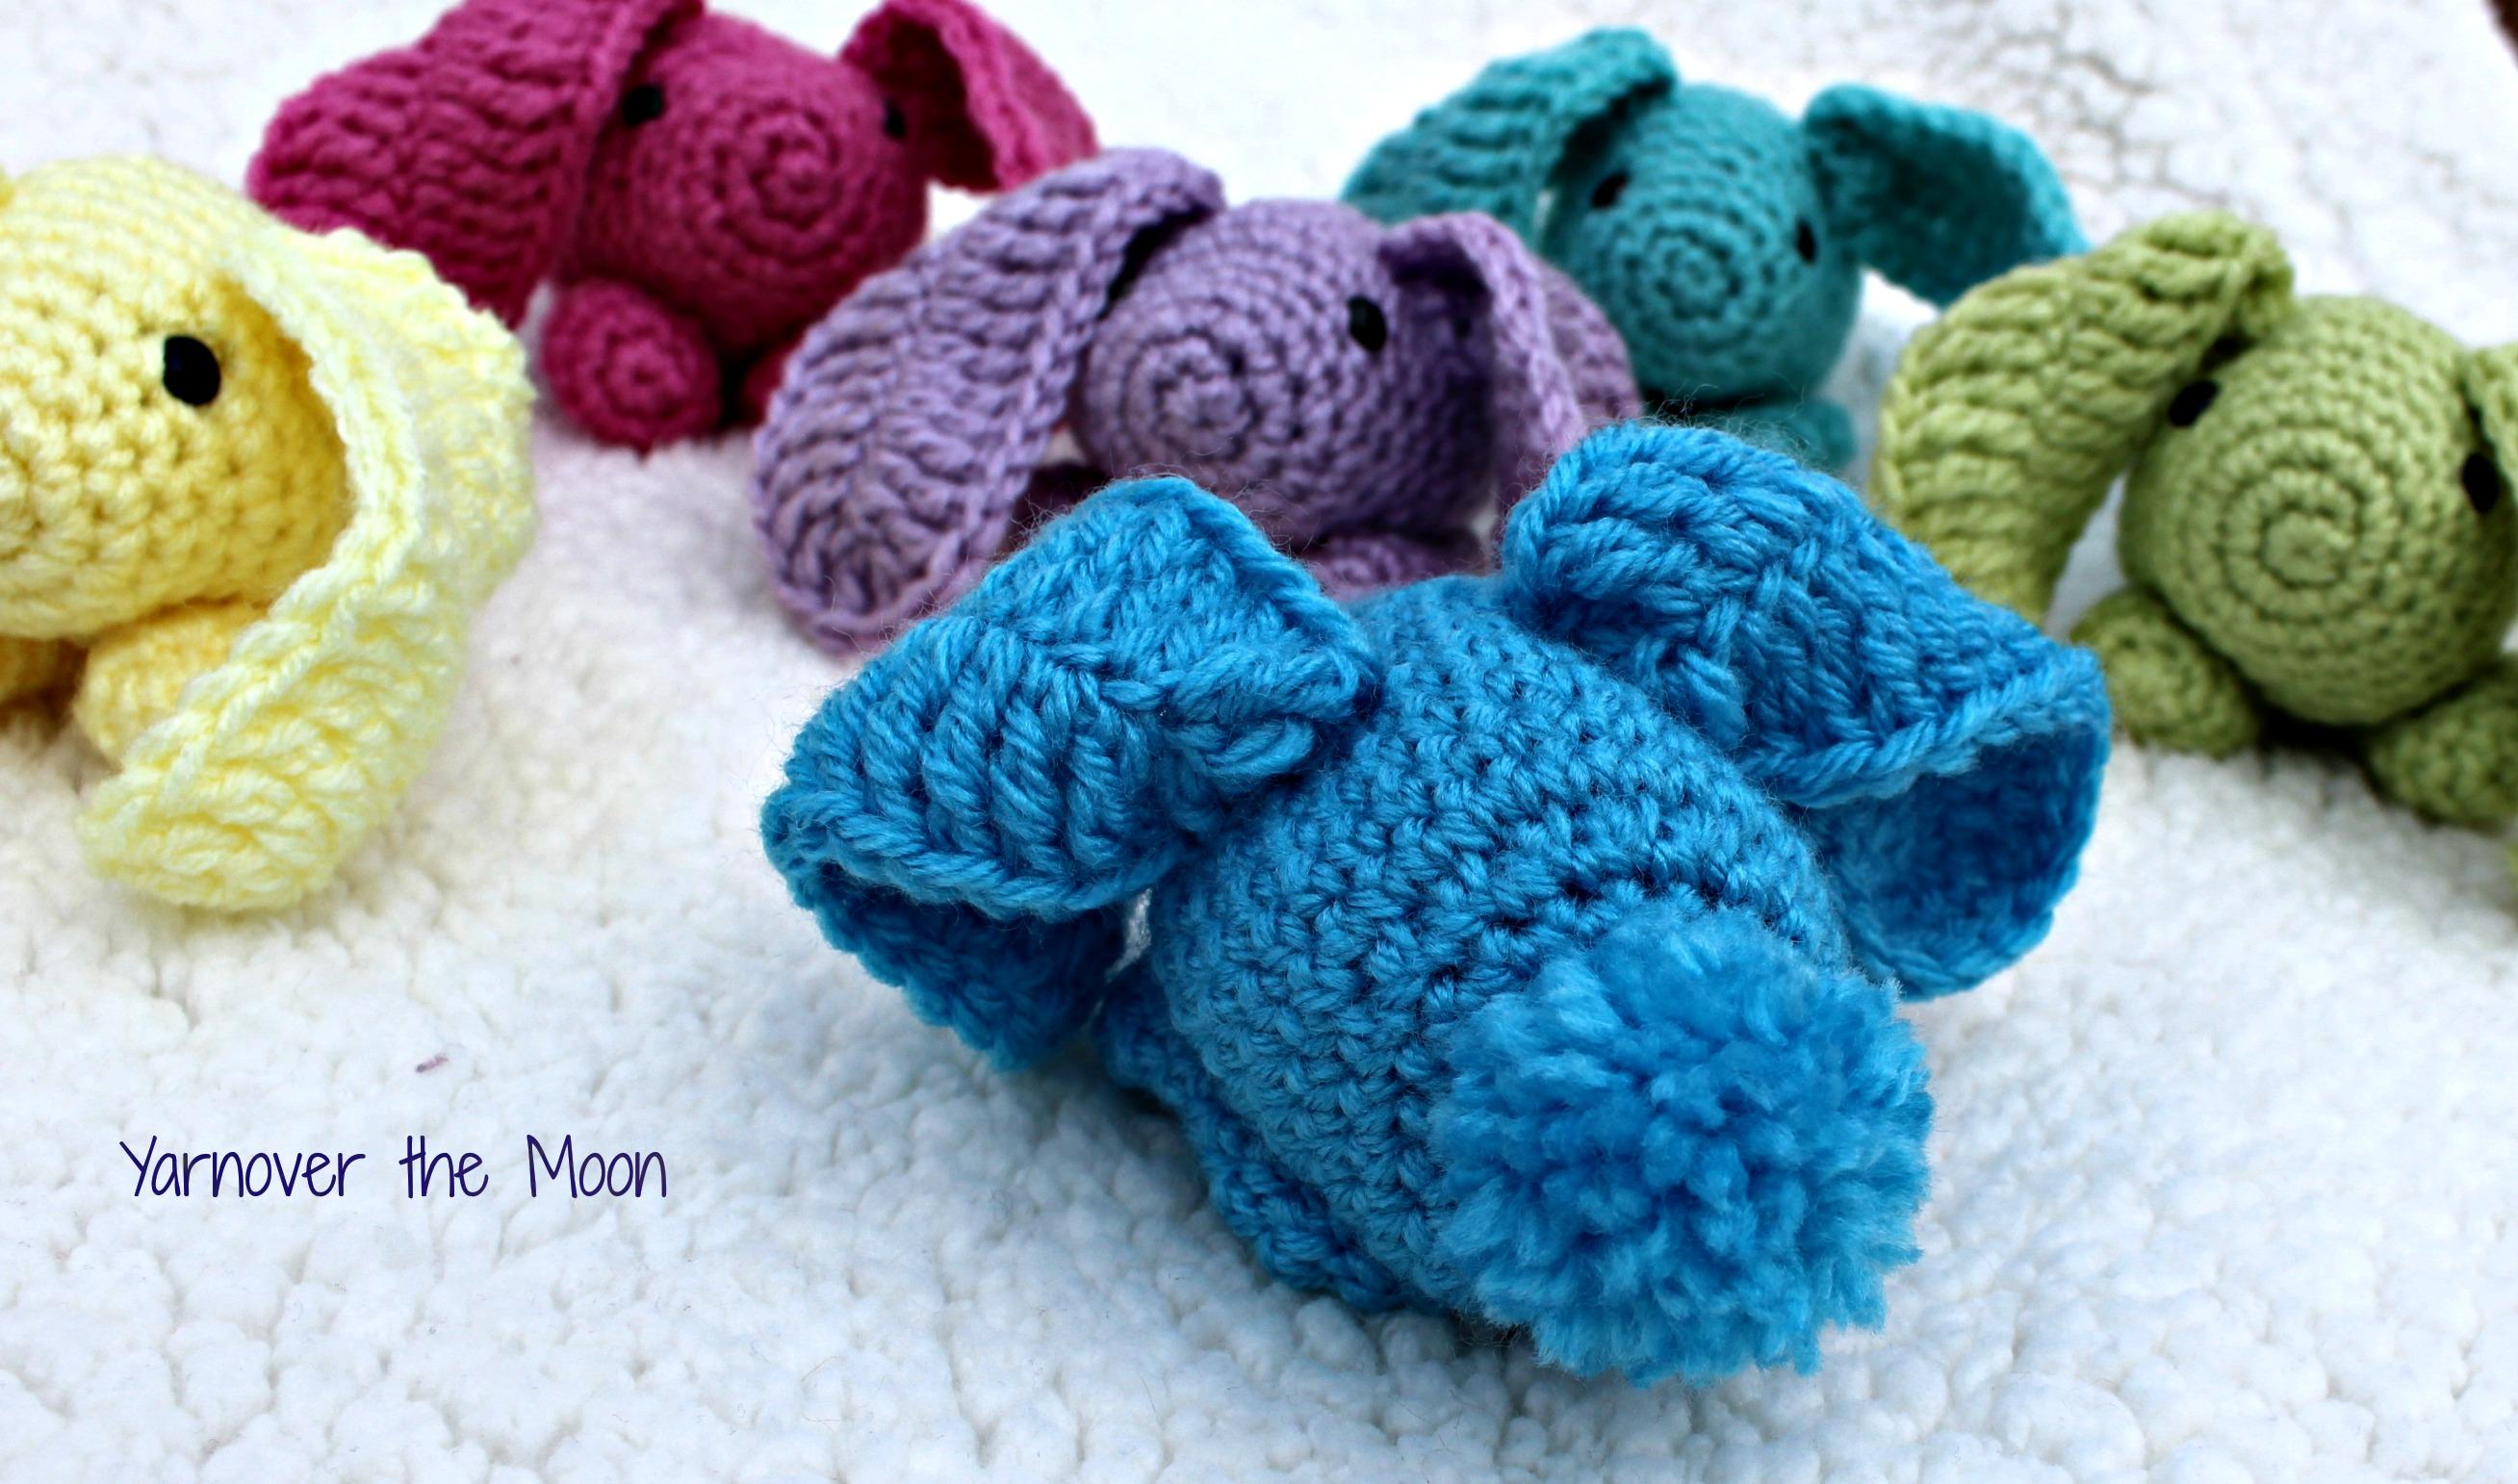 Free Baby Crochet Patterns | Baby Bunny Crochet Pattern by ... | 1542x2616